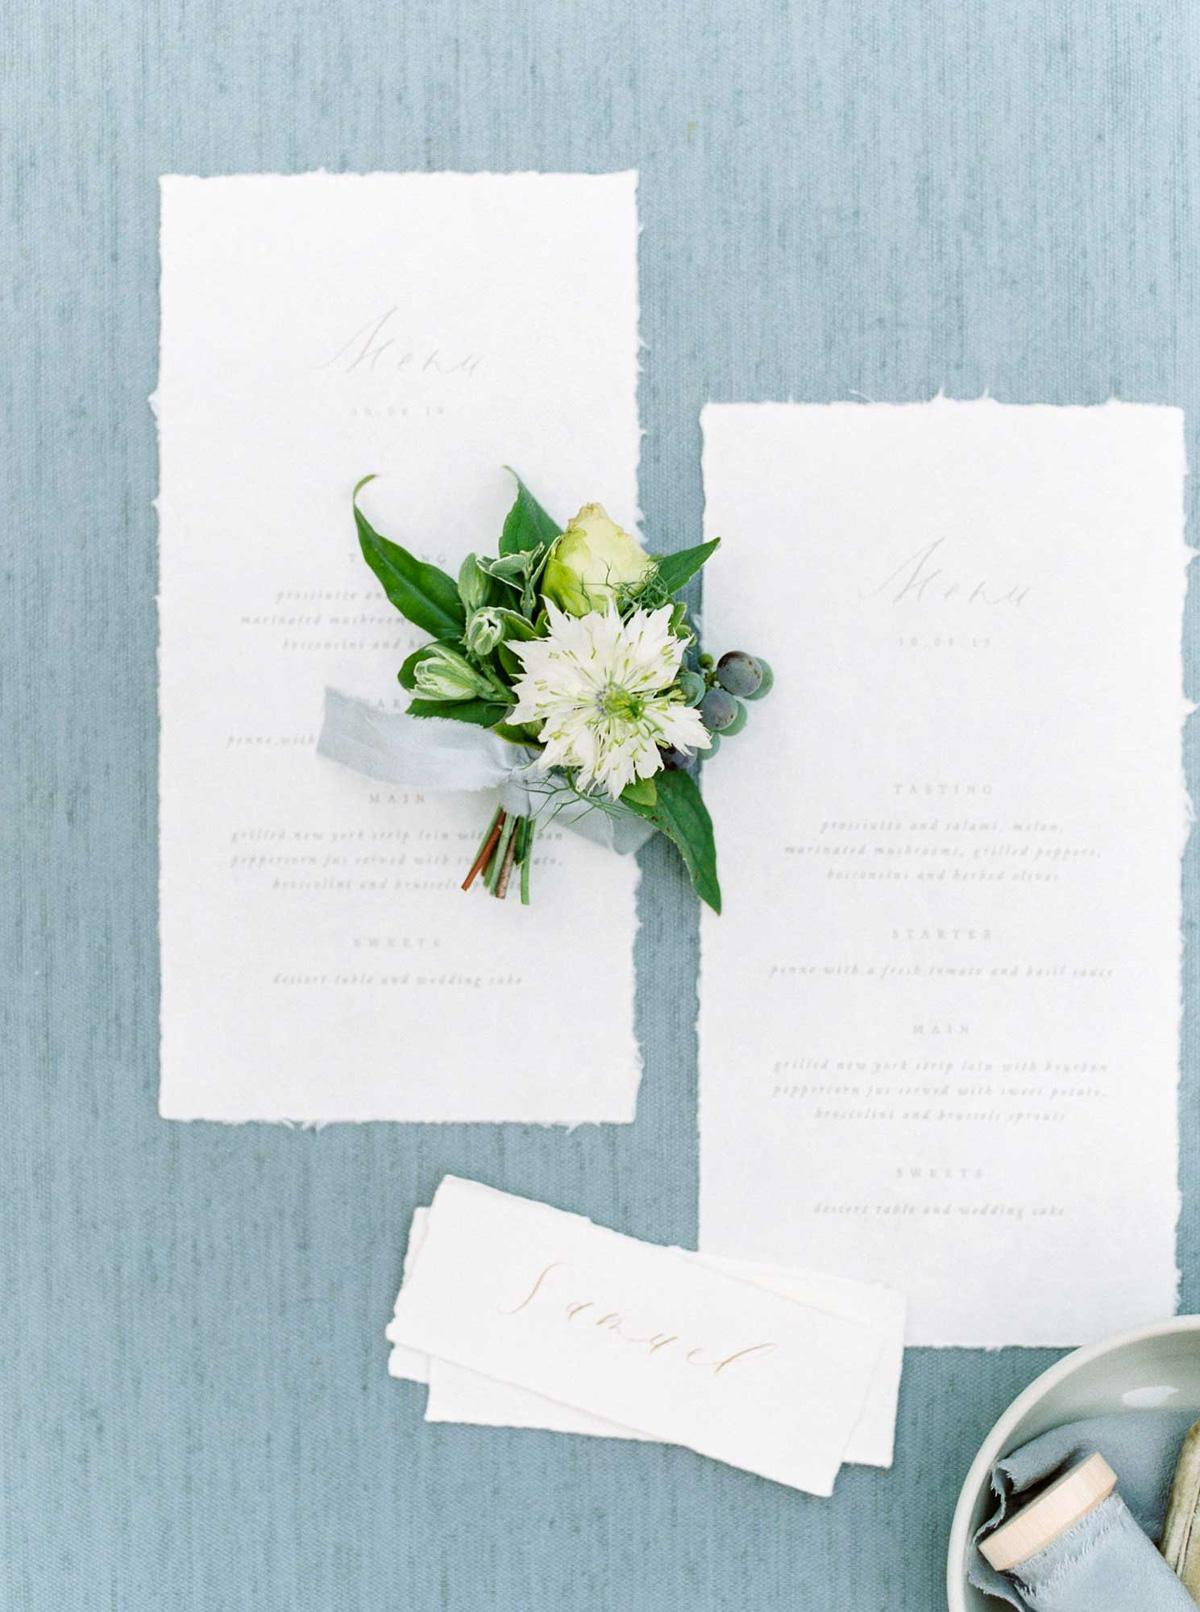 kayla-yestal-vineyard-bride-swish-list-woodland-weddings-niagara-wedding-editorial-8.jpg